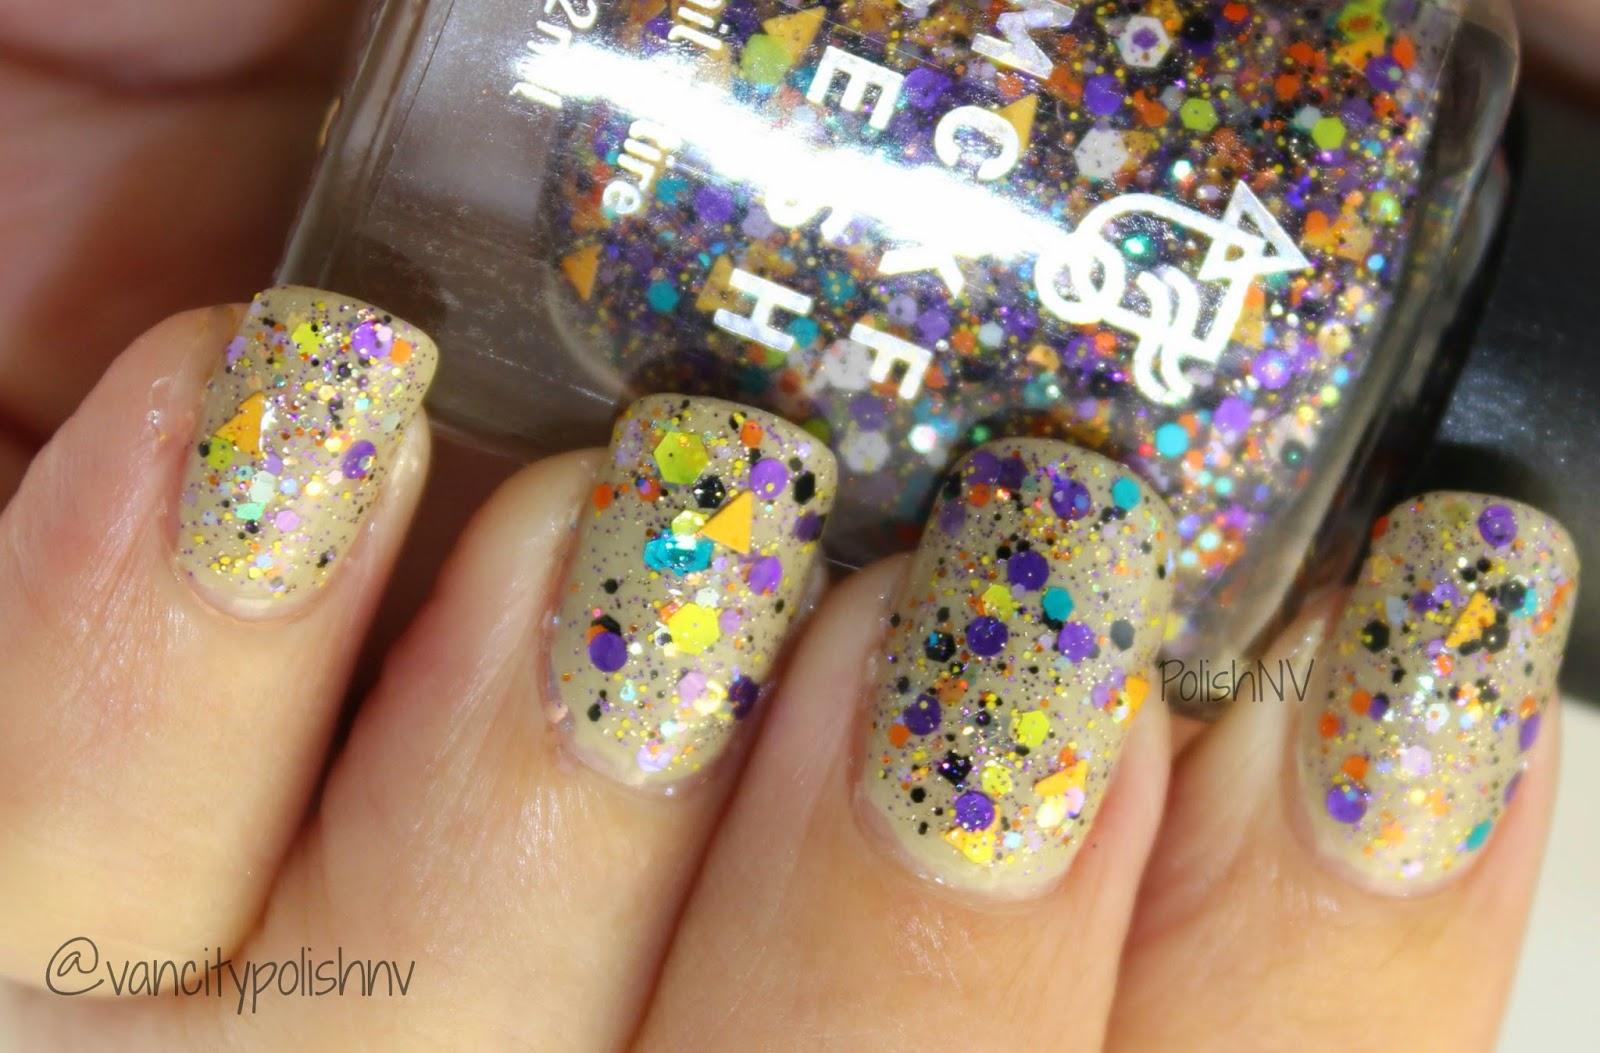 mckfresh nail attire witchy tutu swatches